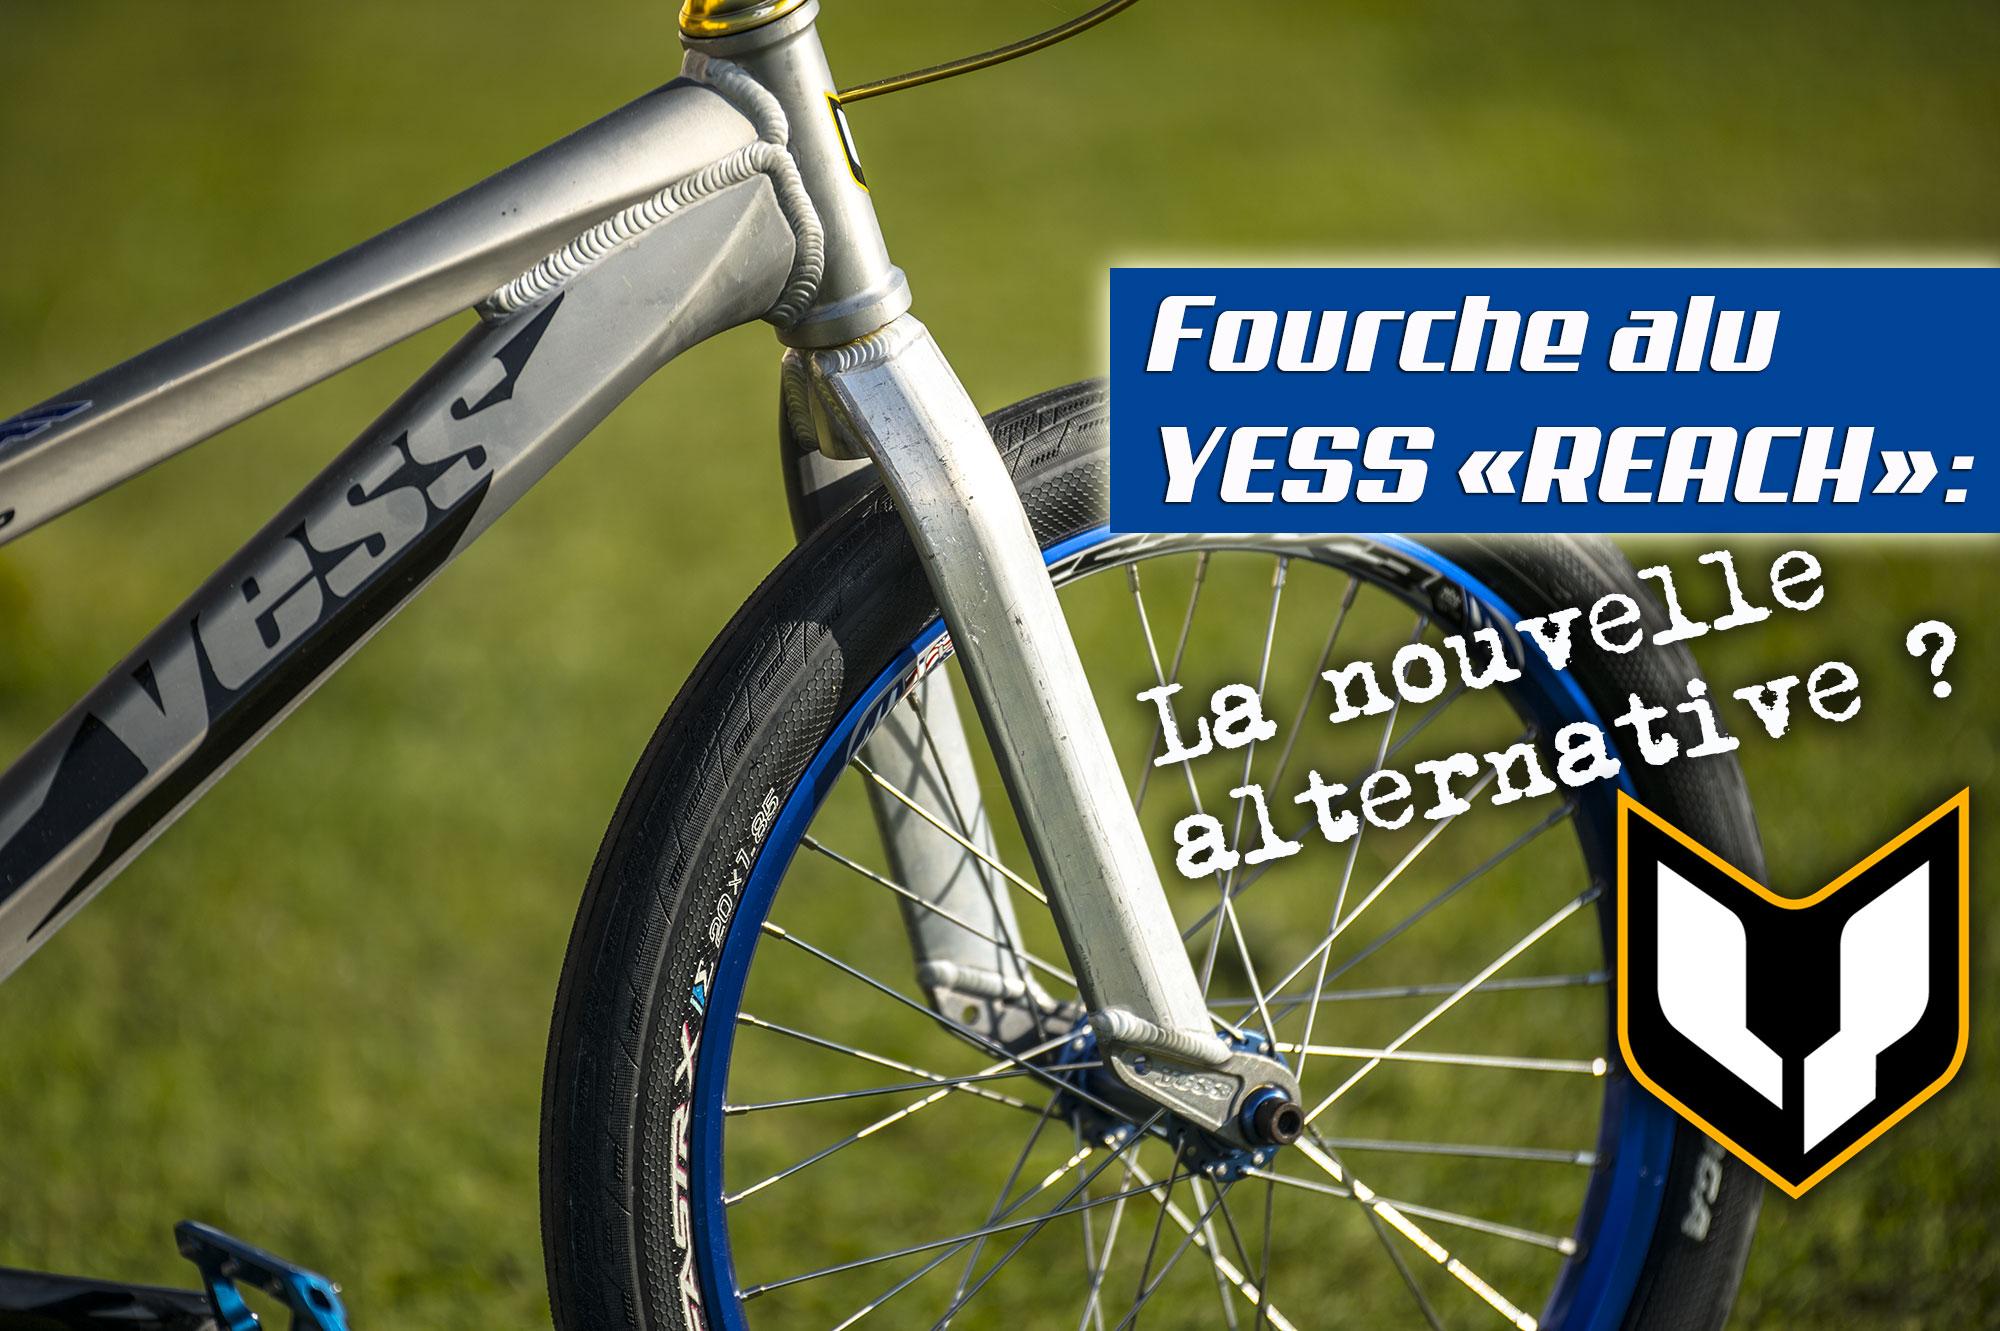 Fourche alu YESS Reach: La nouvelle alternative ?